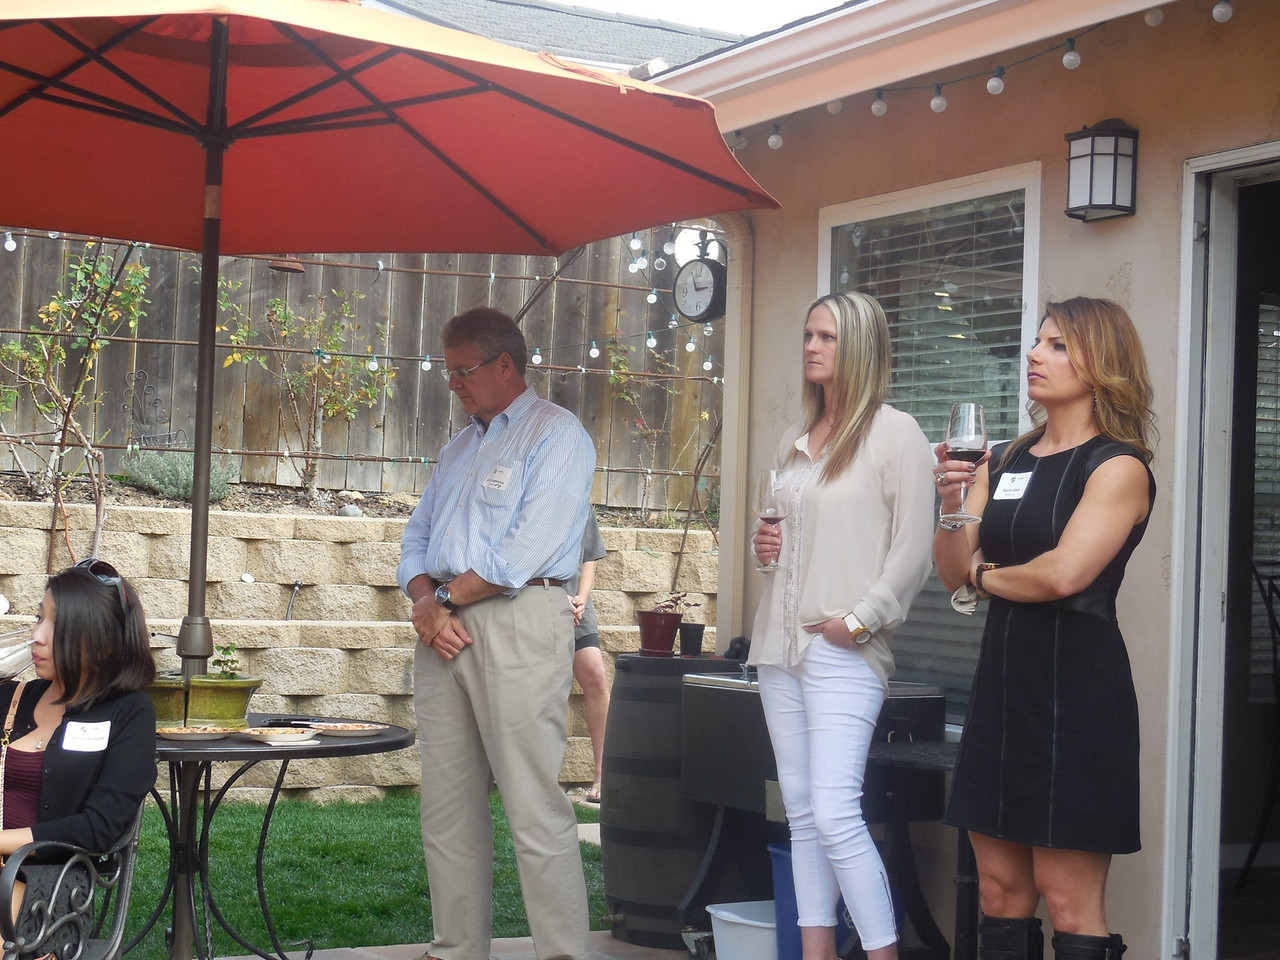 Jim Shaughnessy (Marq. '82), Megan Singer, and Marie Klaas (Mo. '03)